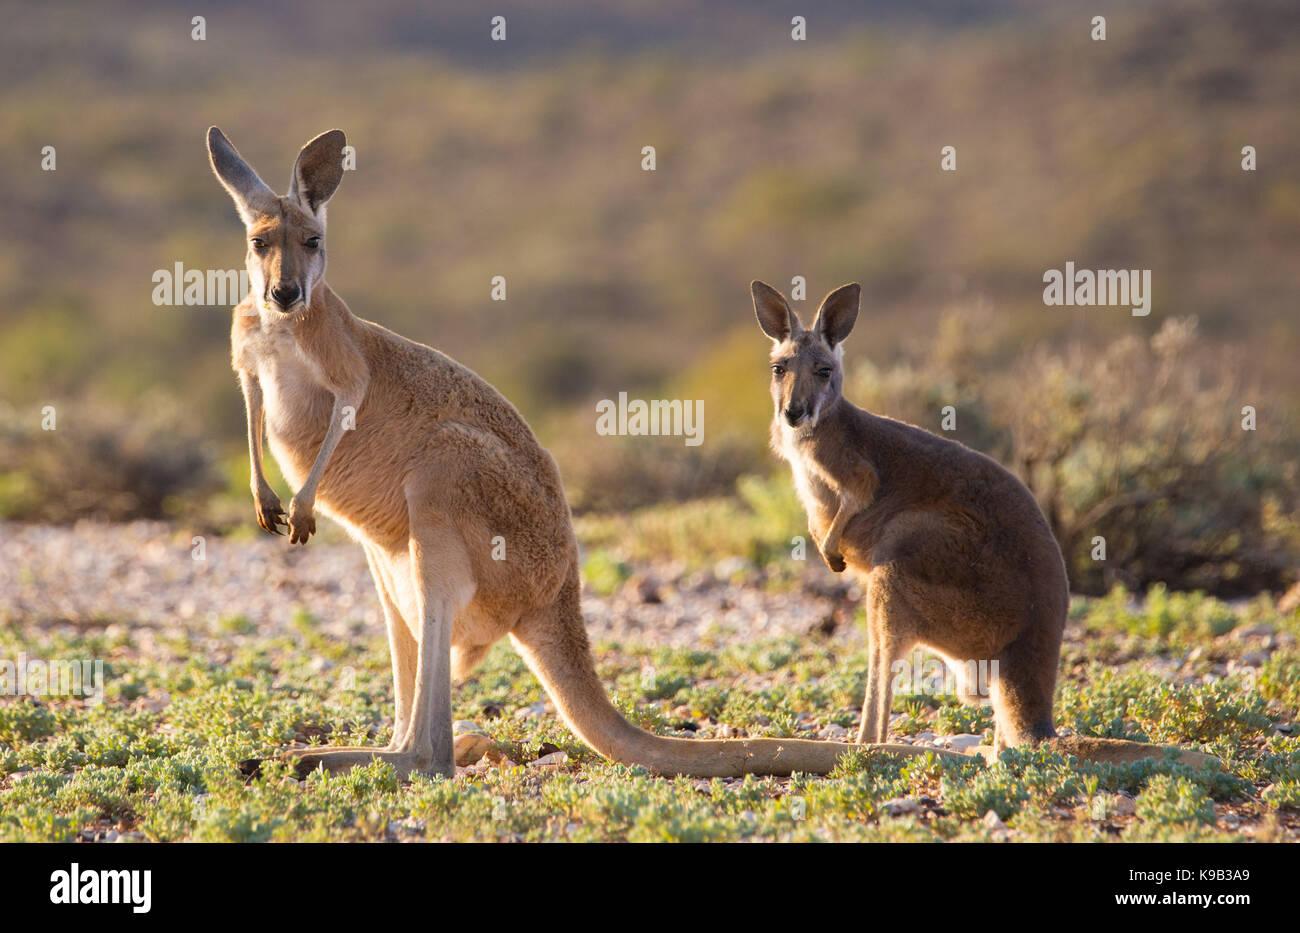 Red Kangaroo (Macropus rufus), Sturt National Park, outback NSW, Australia - Stock Image